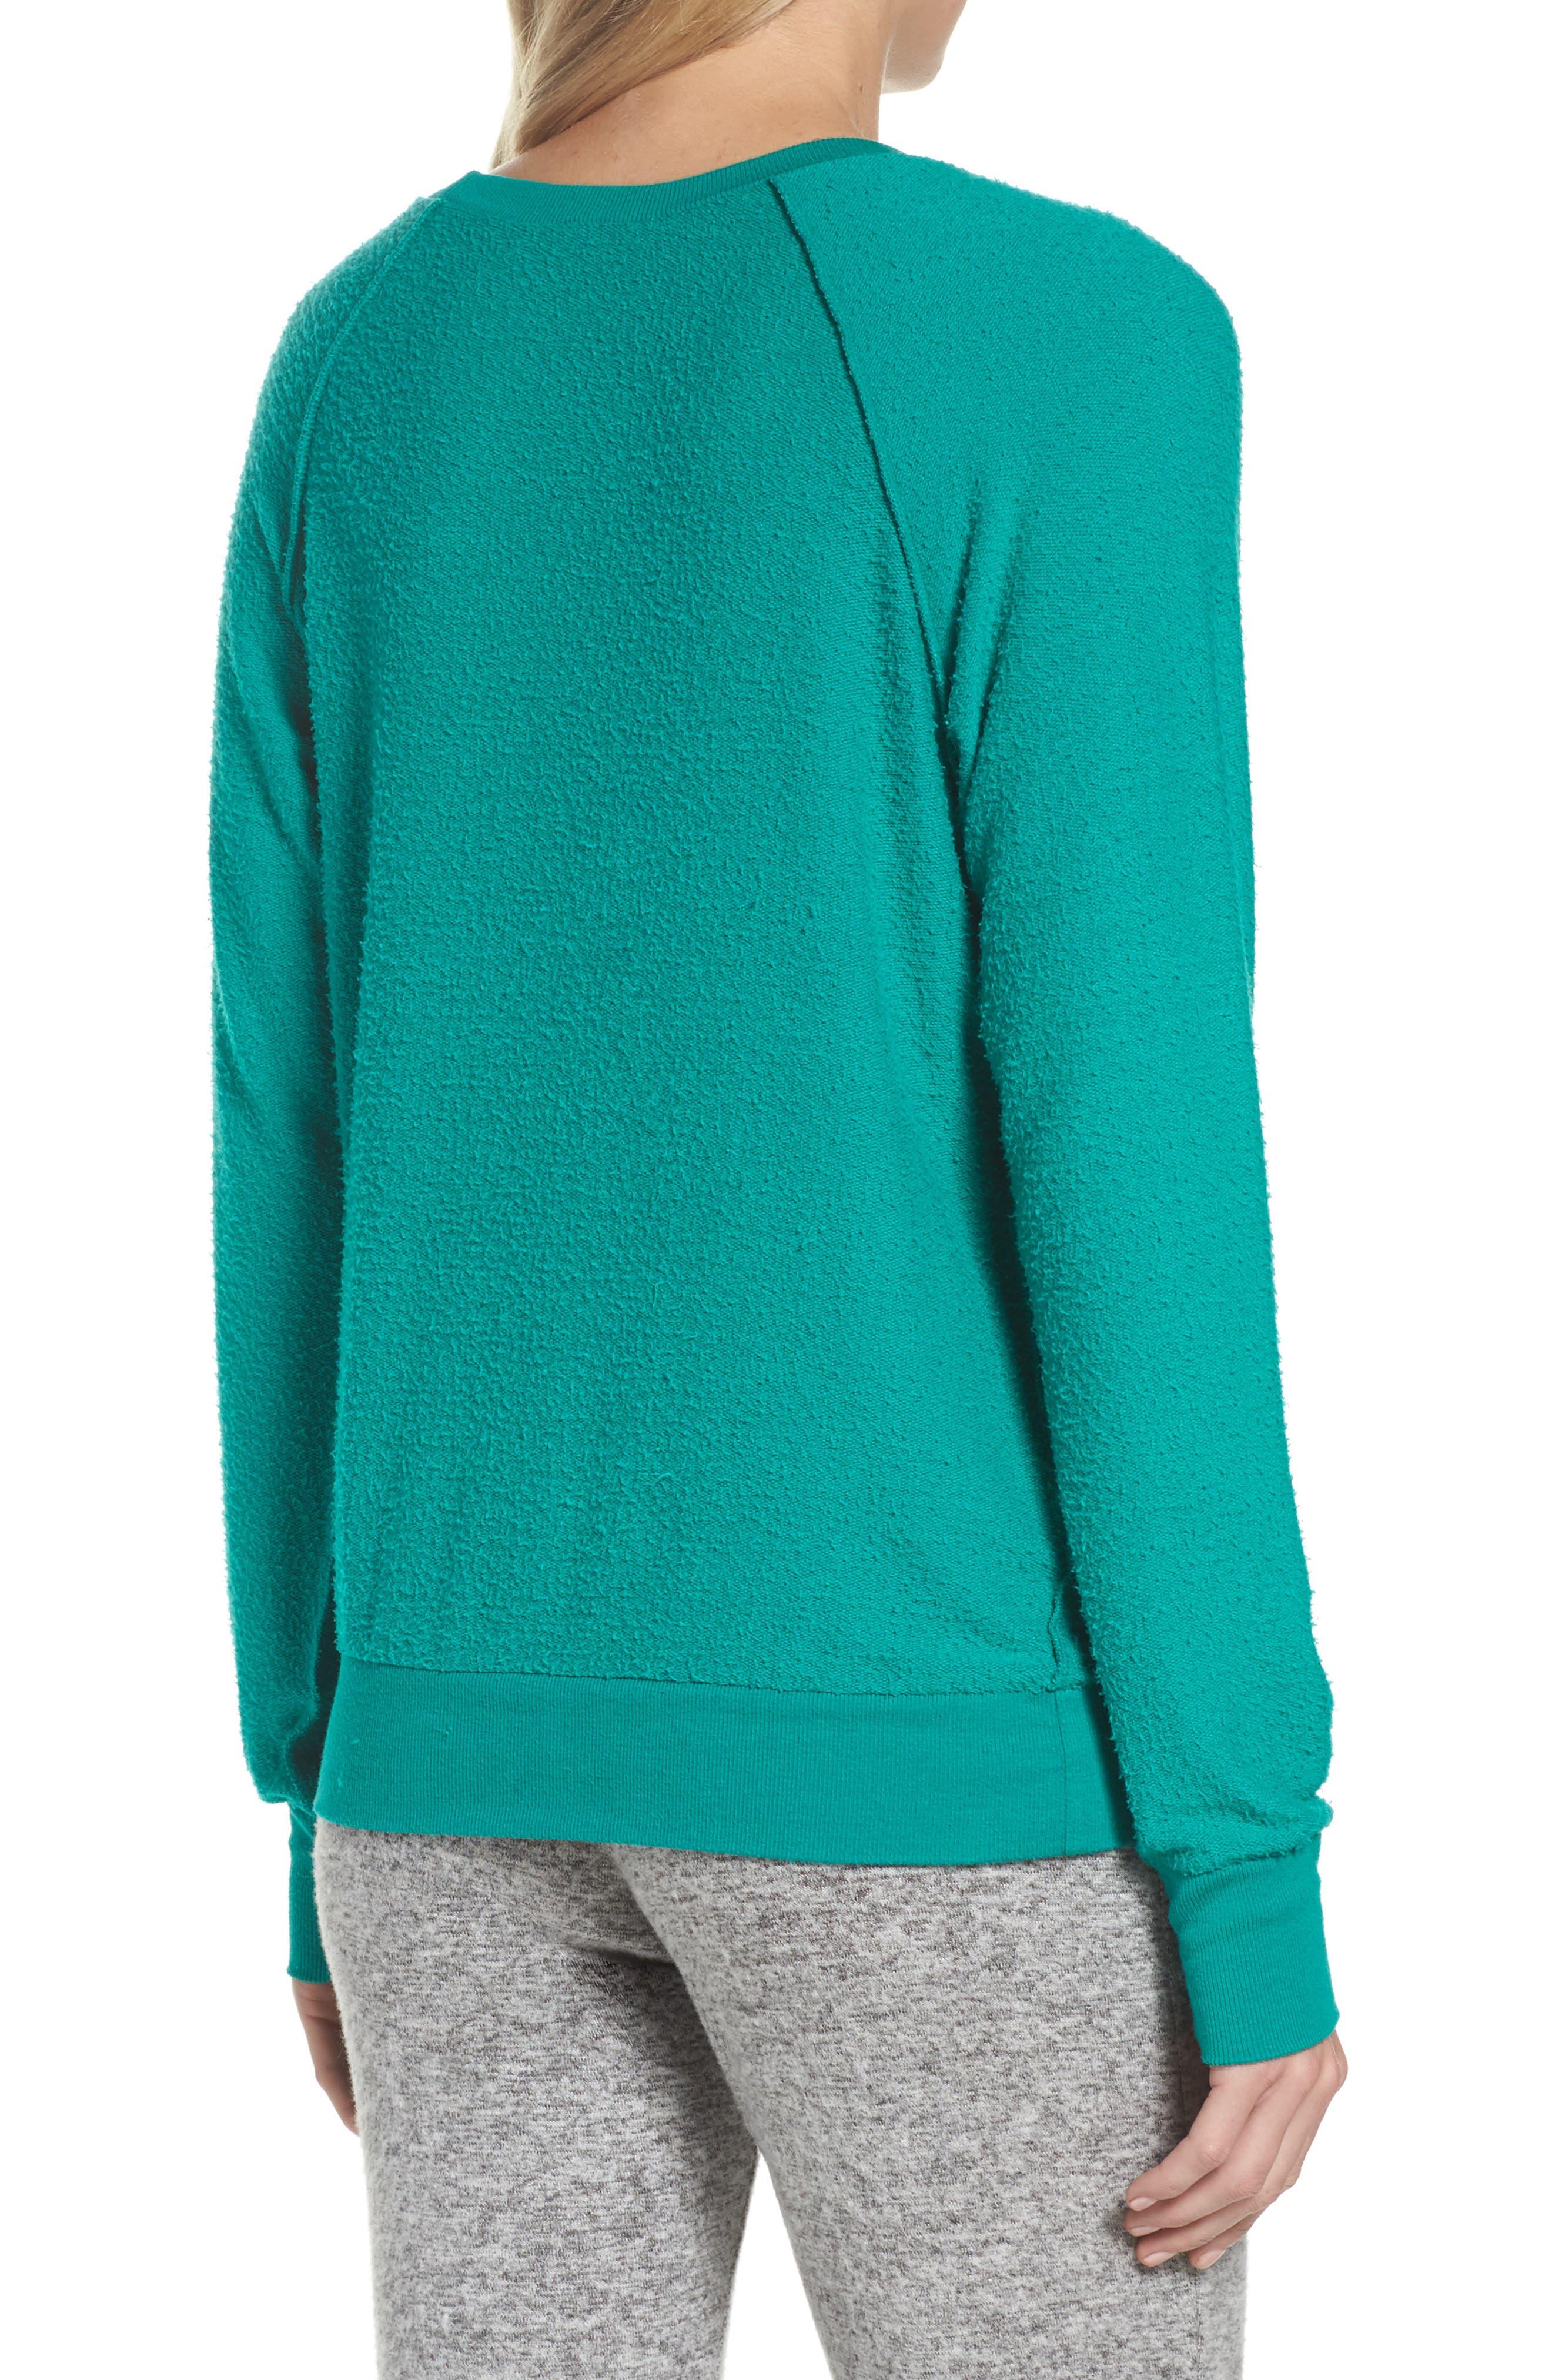 Edge Sweatshirt,                             Alternate thumbnail 2, color,                             Kelly